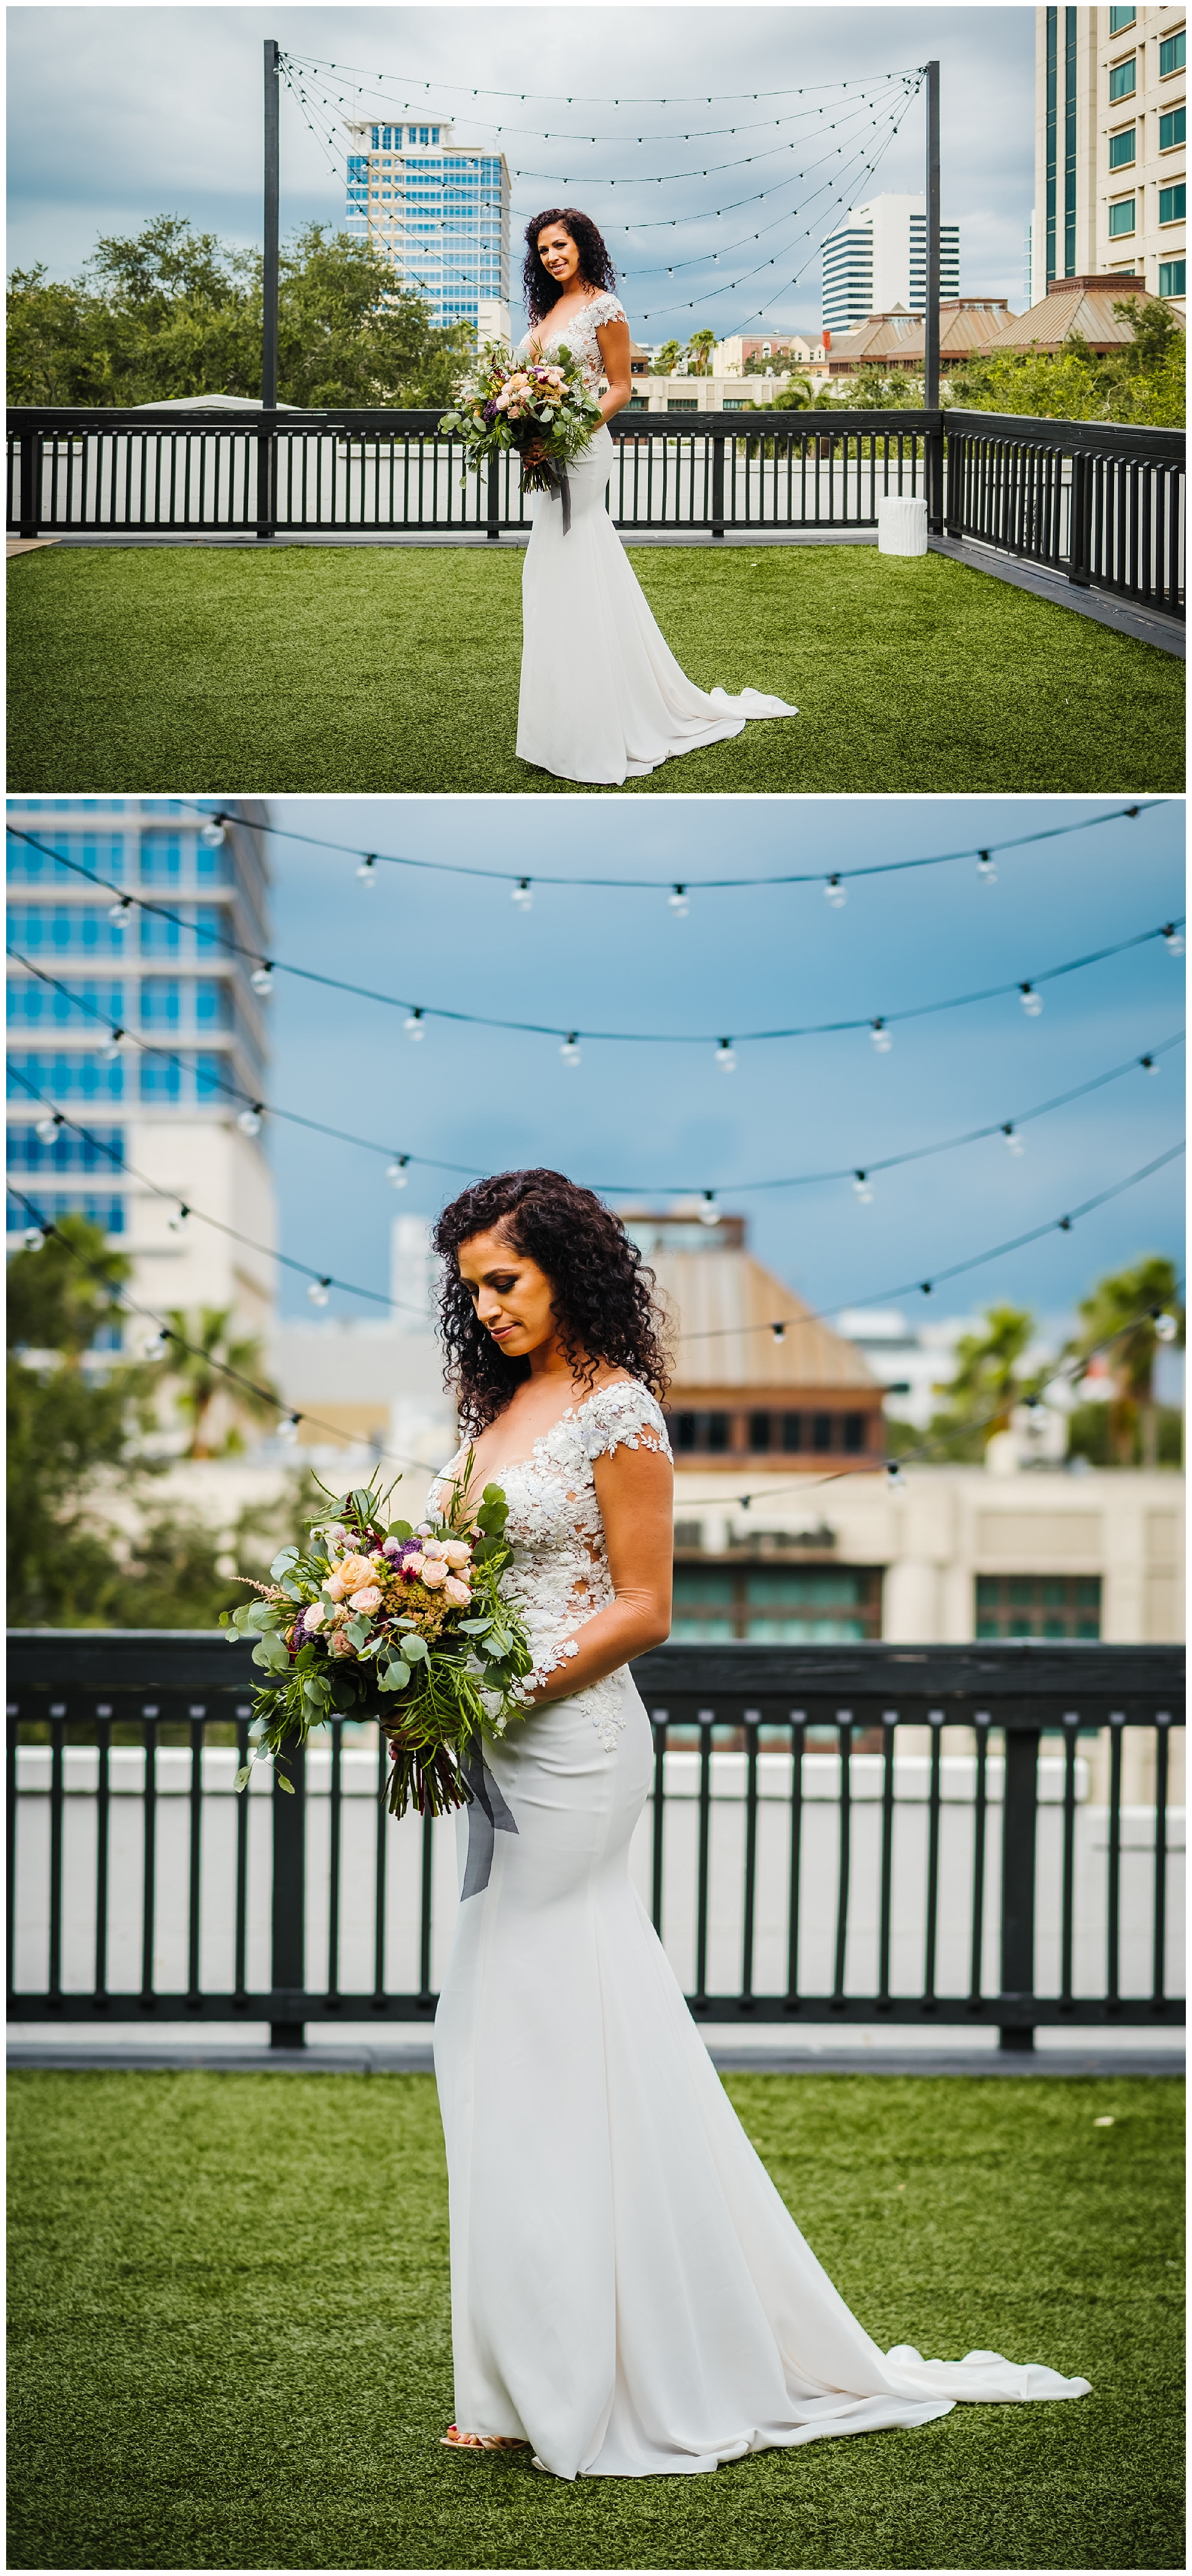 -tampa-st-pete-wedding-portrait-studio-photographer-colorful-vibrant-creative_0121.jpg